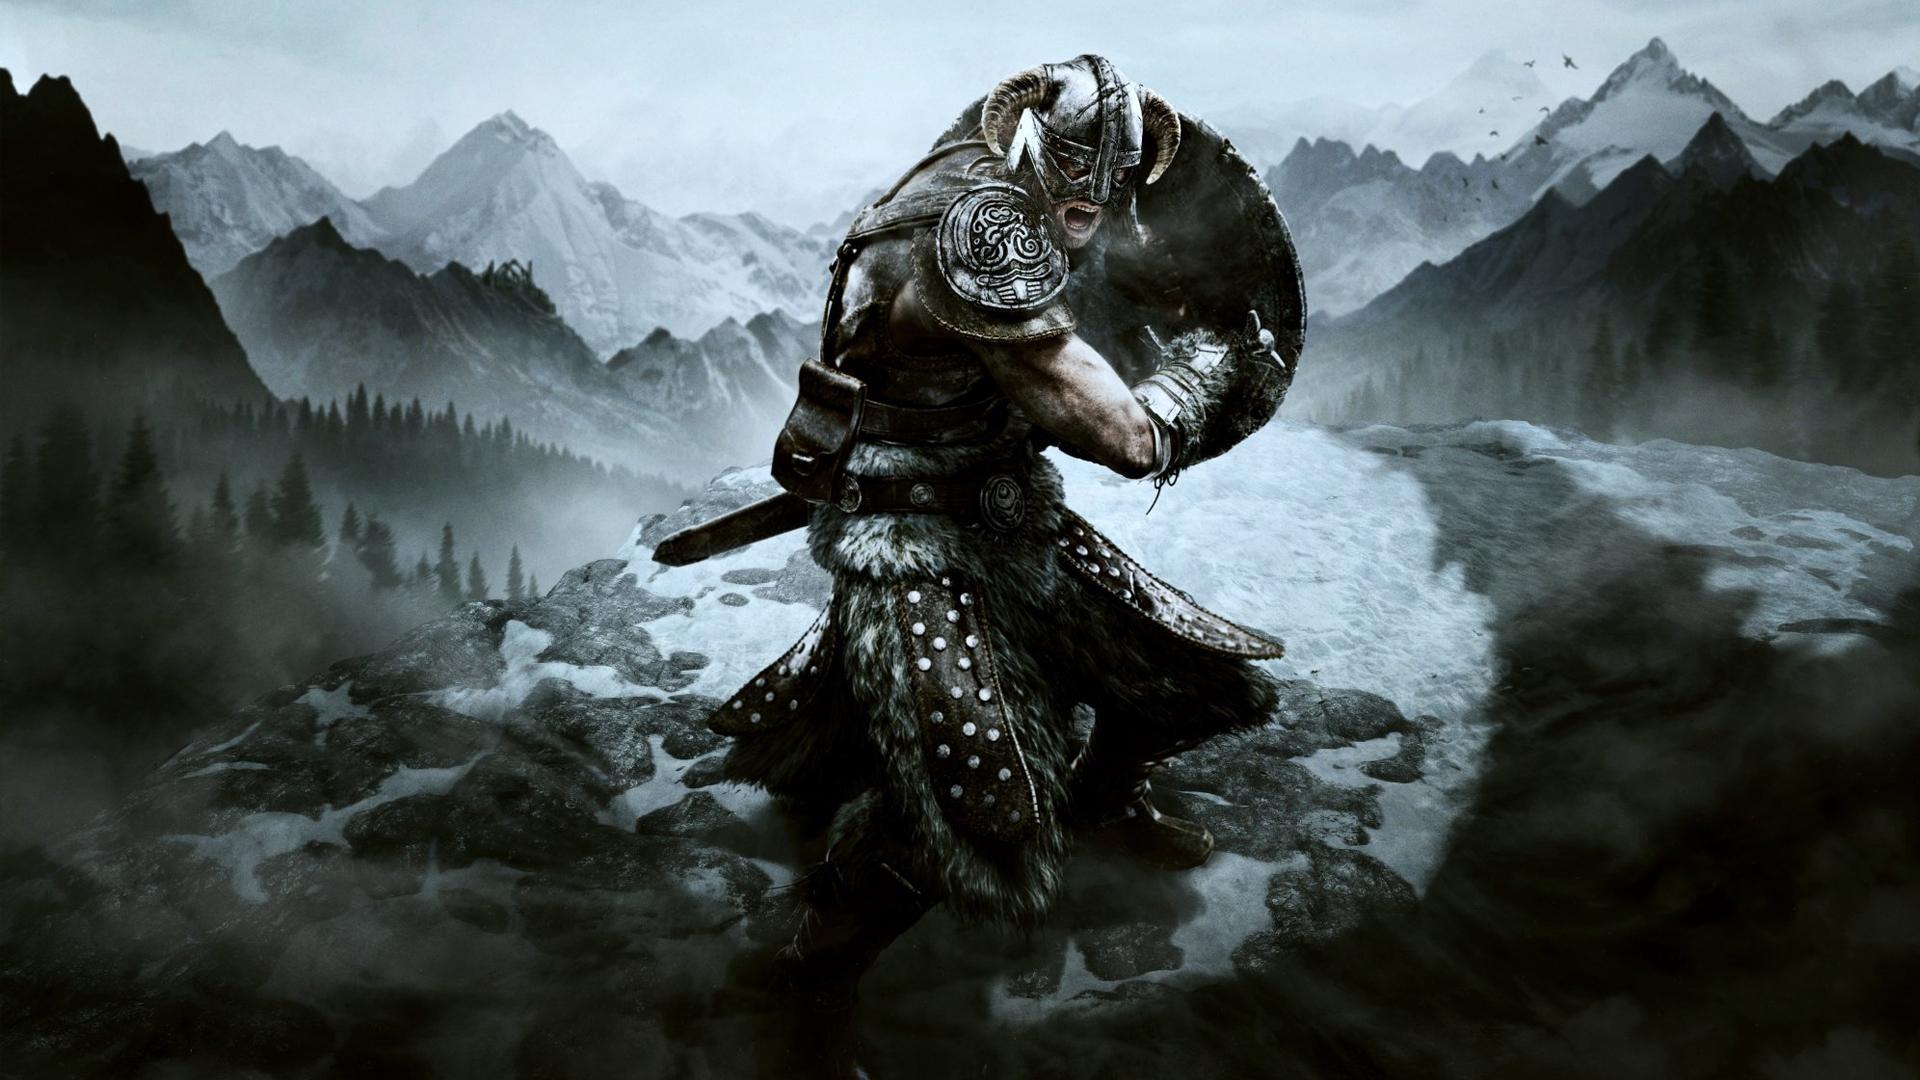 The Elder Scrolls V Skyrim Atlas & Art Gallery Platinum Edition